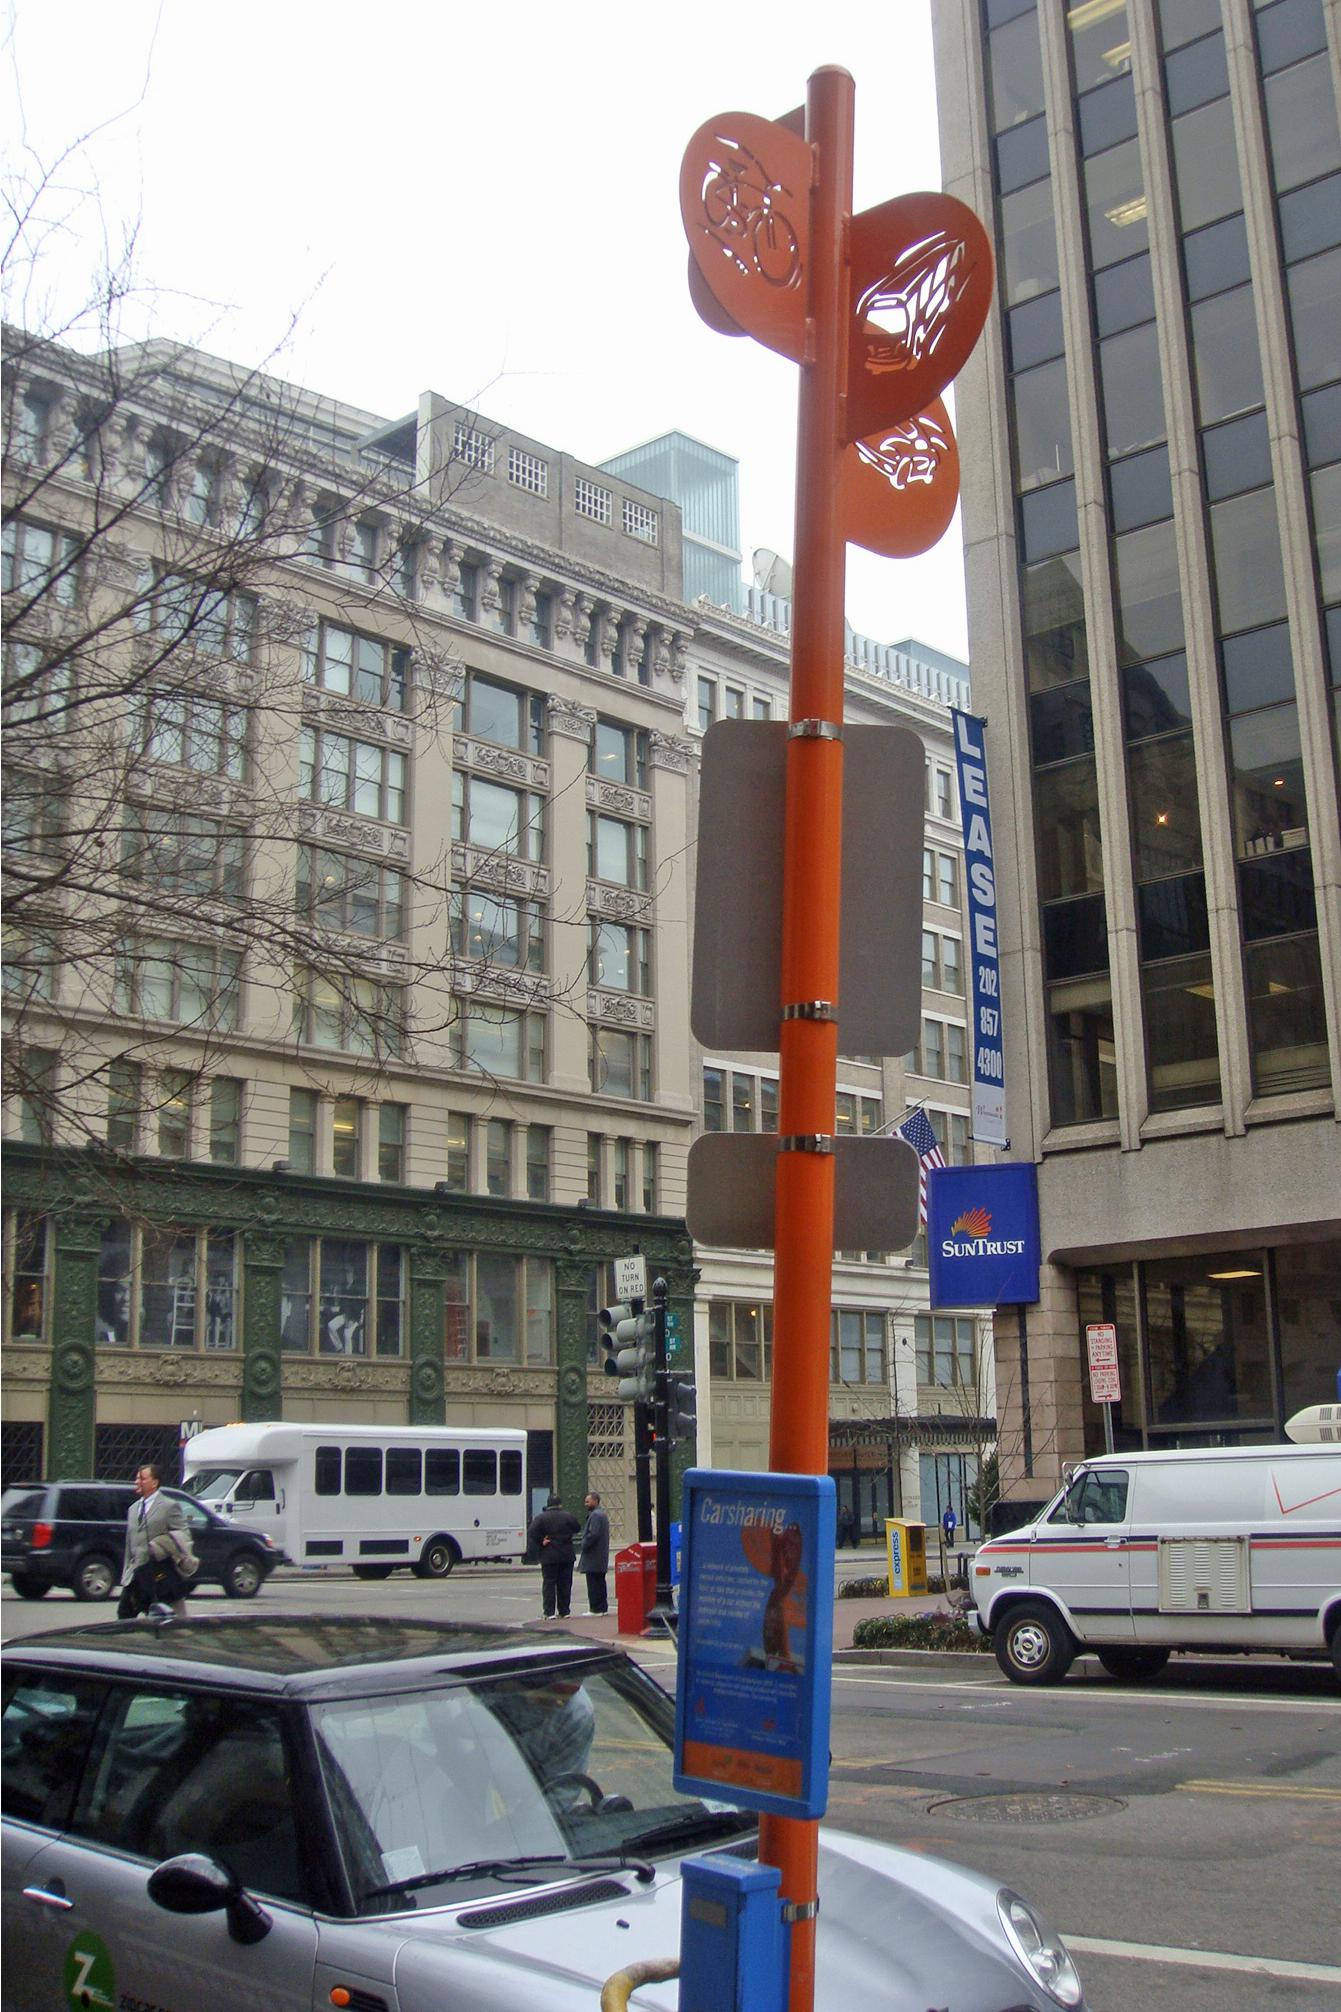 Zipcar drop off/pick up area in downtown Washington, D.C.